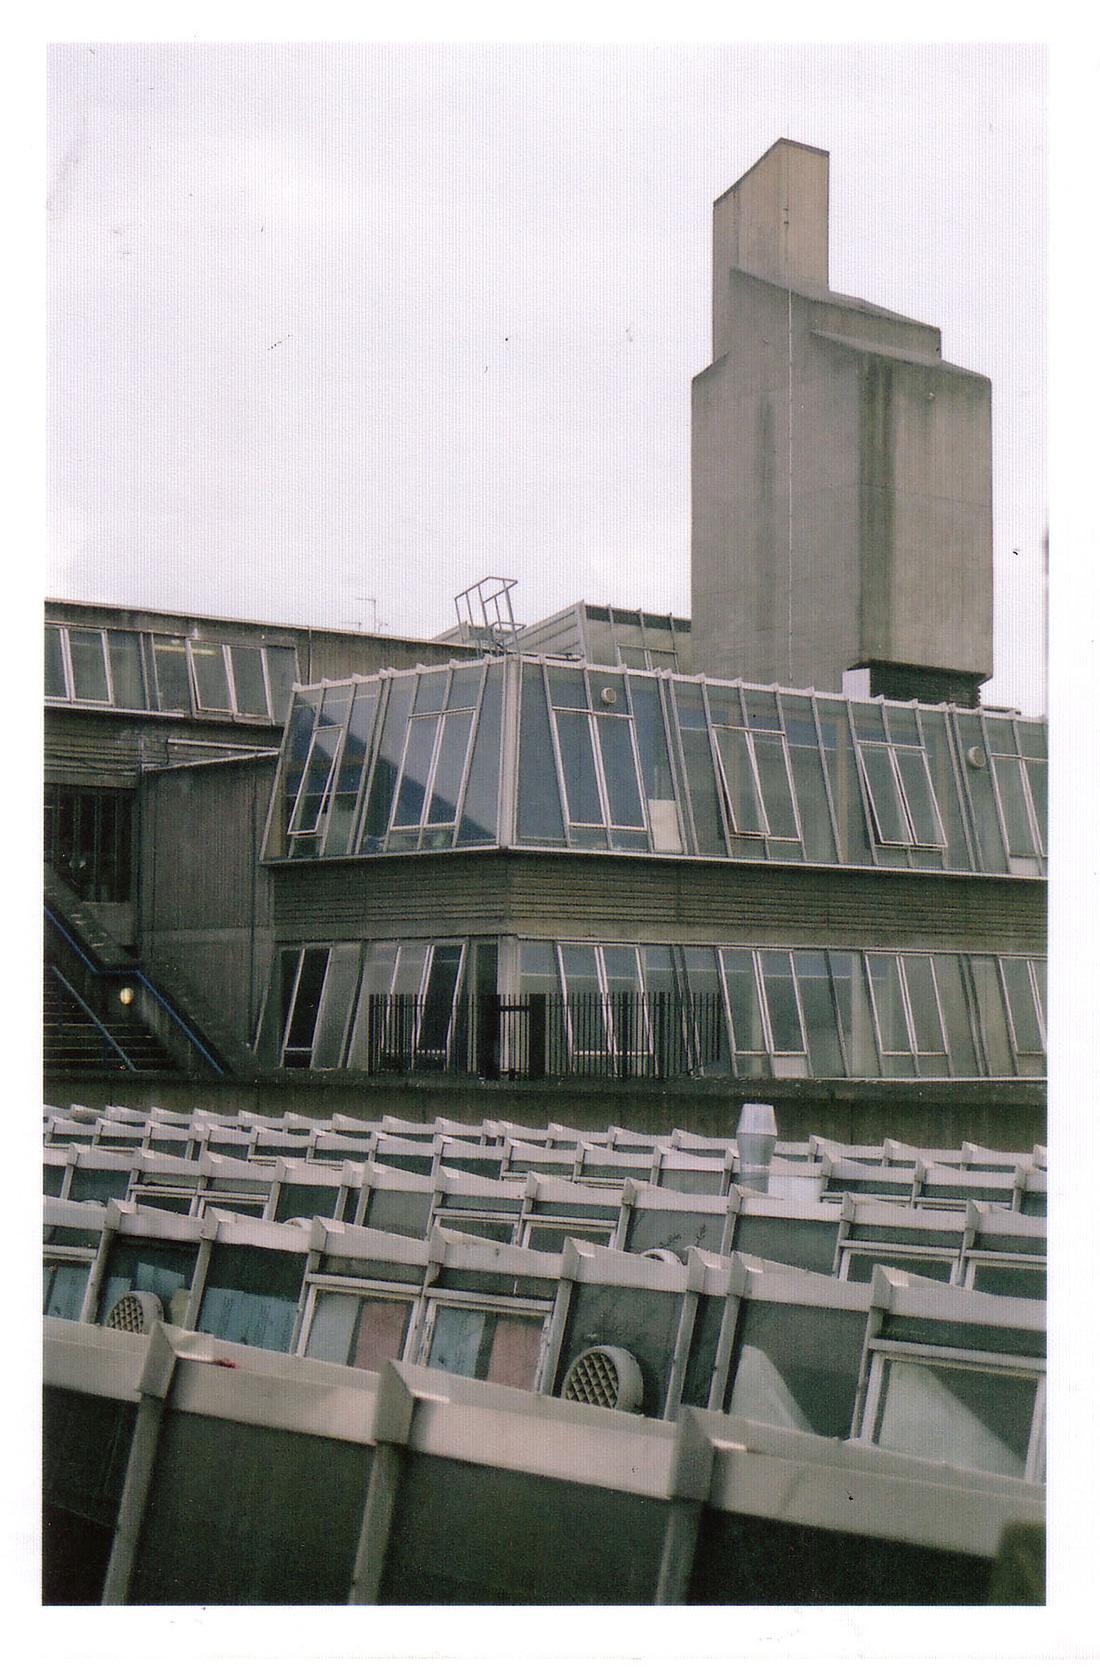 The Pimlico school, designed by John Bancroft, 1967.